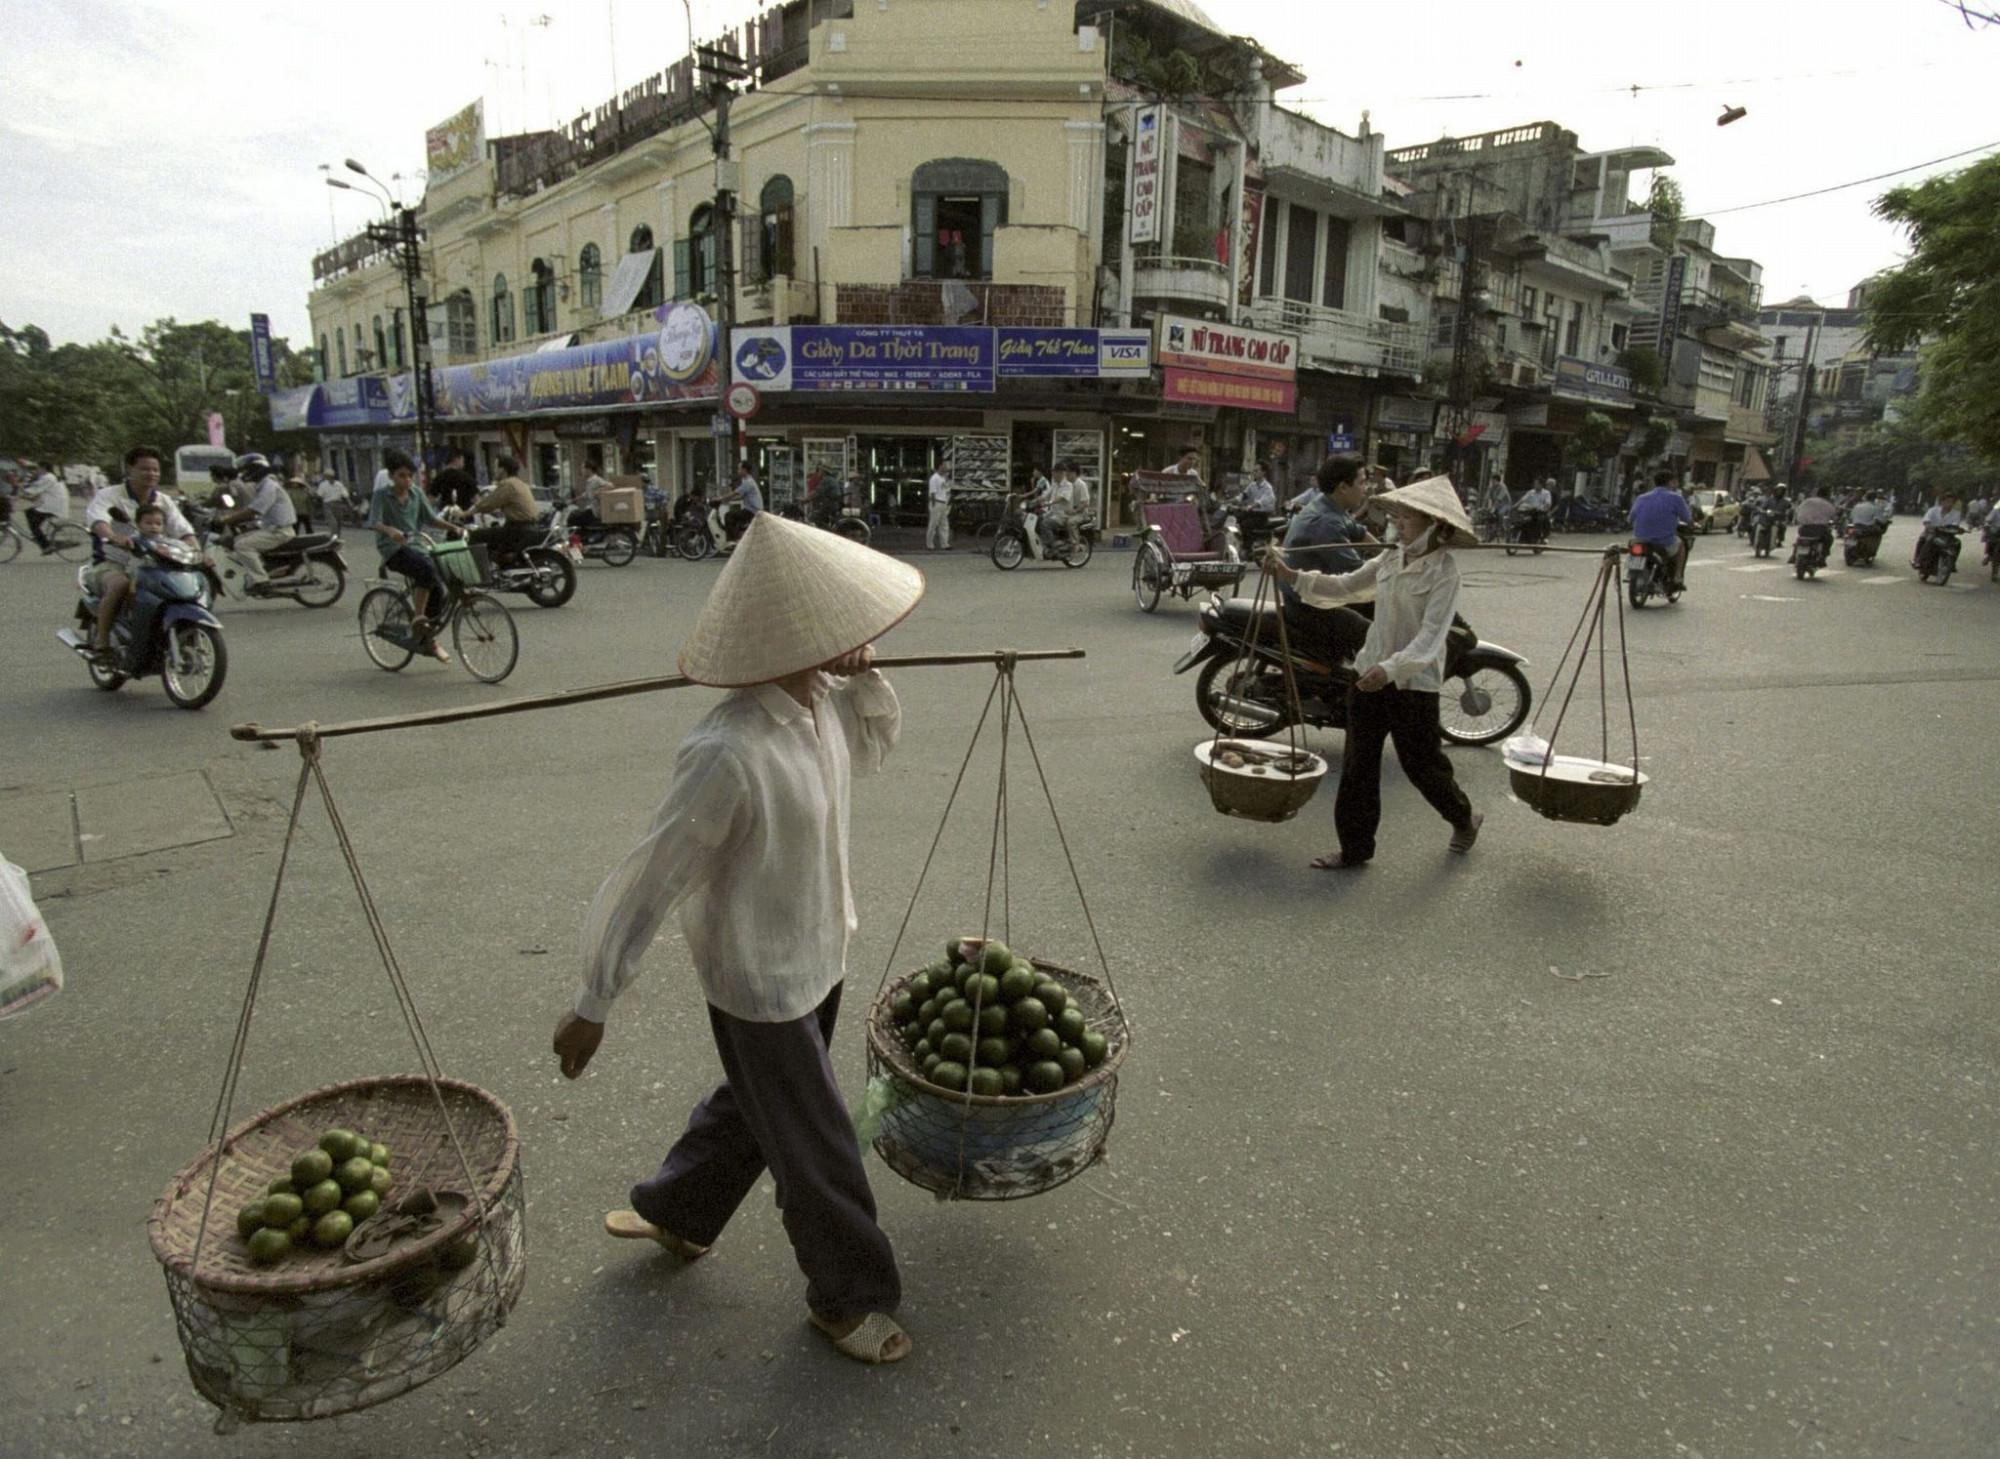 2000 Hanoi by Ulrich Baumgarten